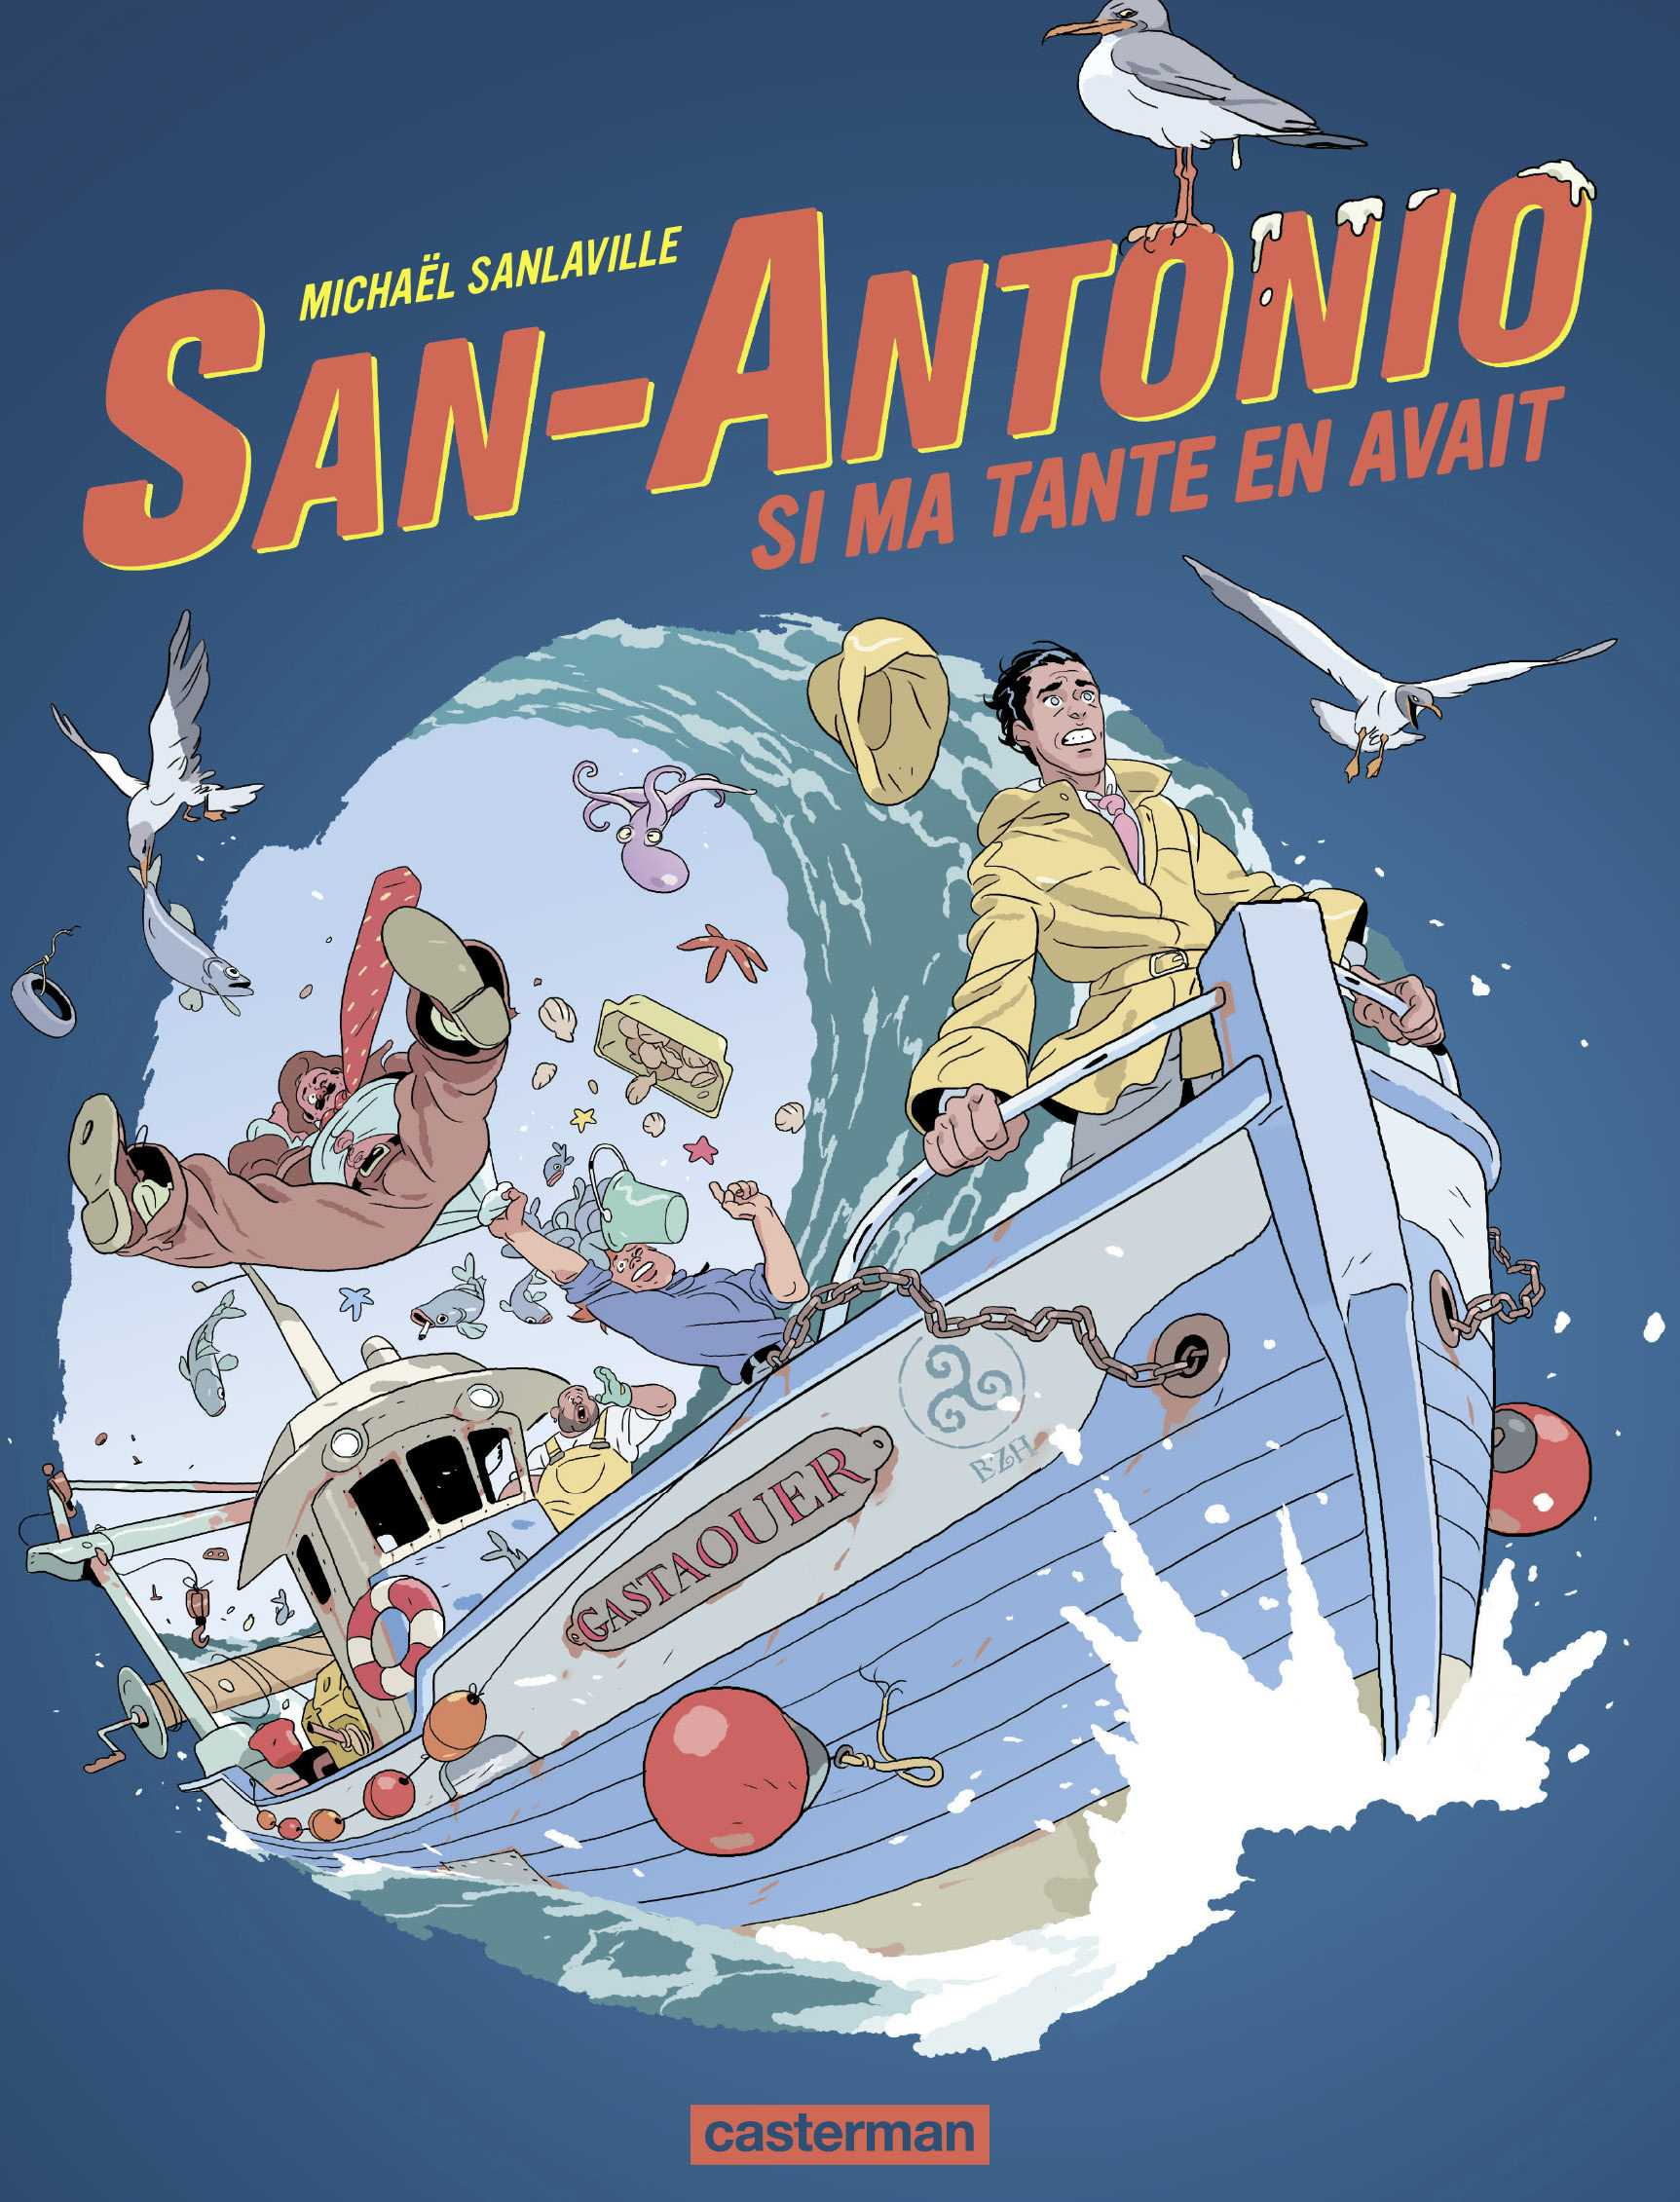 San-Antonio, si ma tante en avait, Sanlaville repart avec Dard